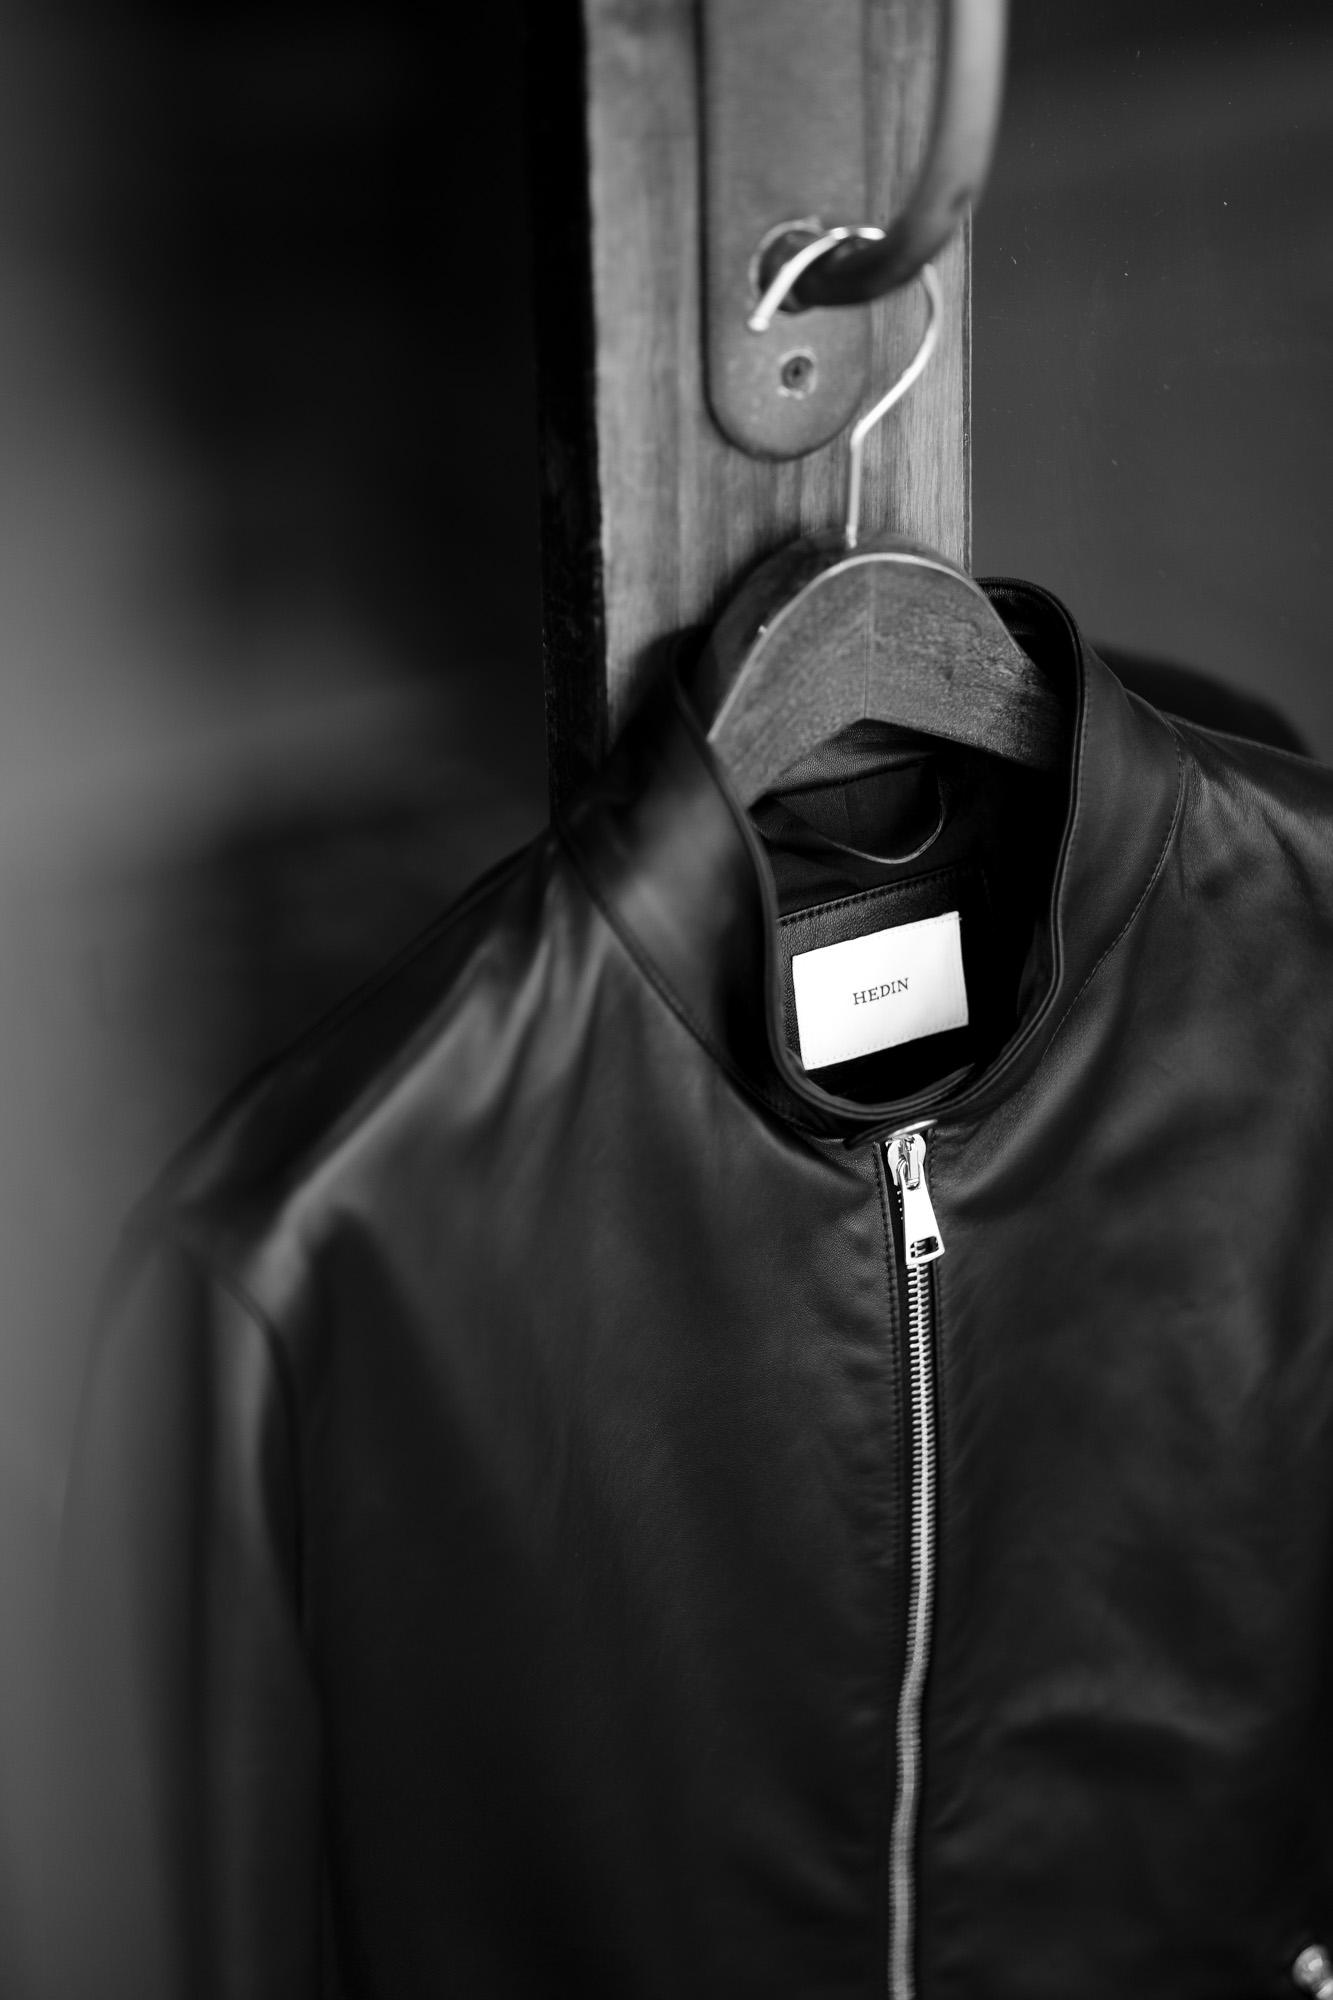 "HEDIN ""KIMON"" Single Leather Jacket Lamb Leather NERO 2021AW 着物 ジャパン 日本着物 HEDIN (エディン) KIMON Single Leather Jacket (シングル レザー ジャケット) Lamb Leather ラムレザー シングル ライダース ジャケット NERO (ブラック) Made in italy (イタリア製) 愛知 名古屋 Alto e Diritto altoediritto アルトエデリット"